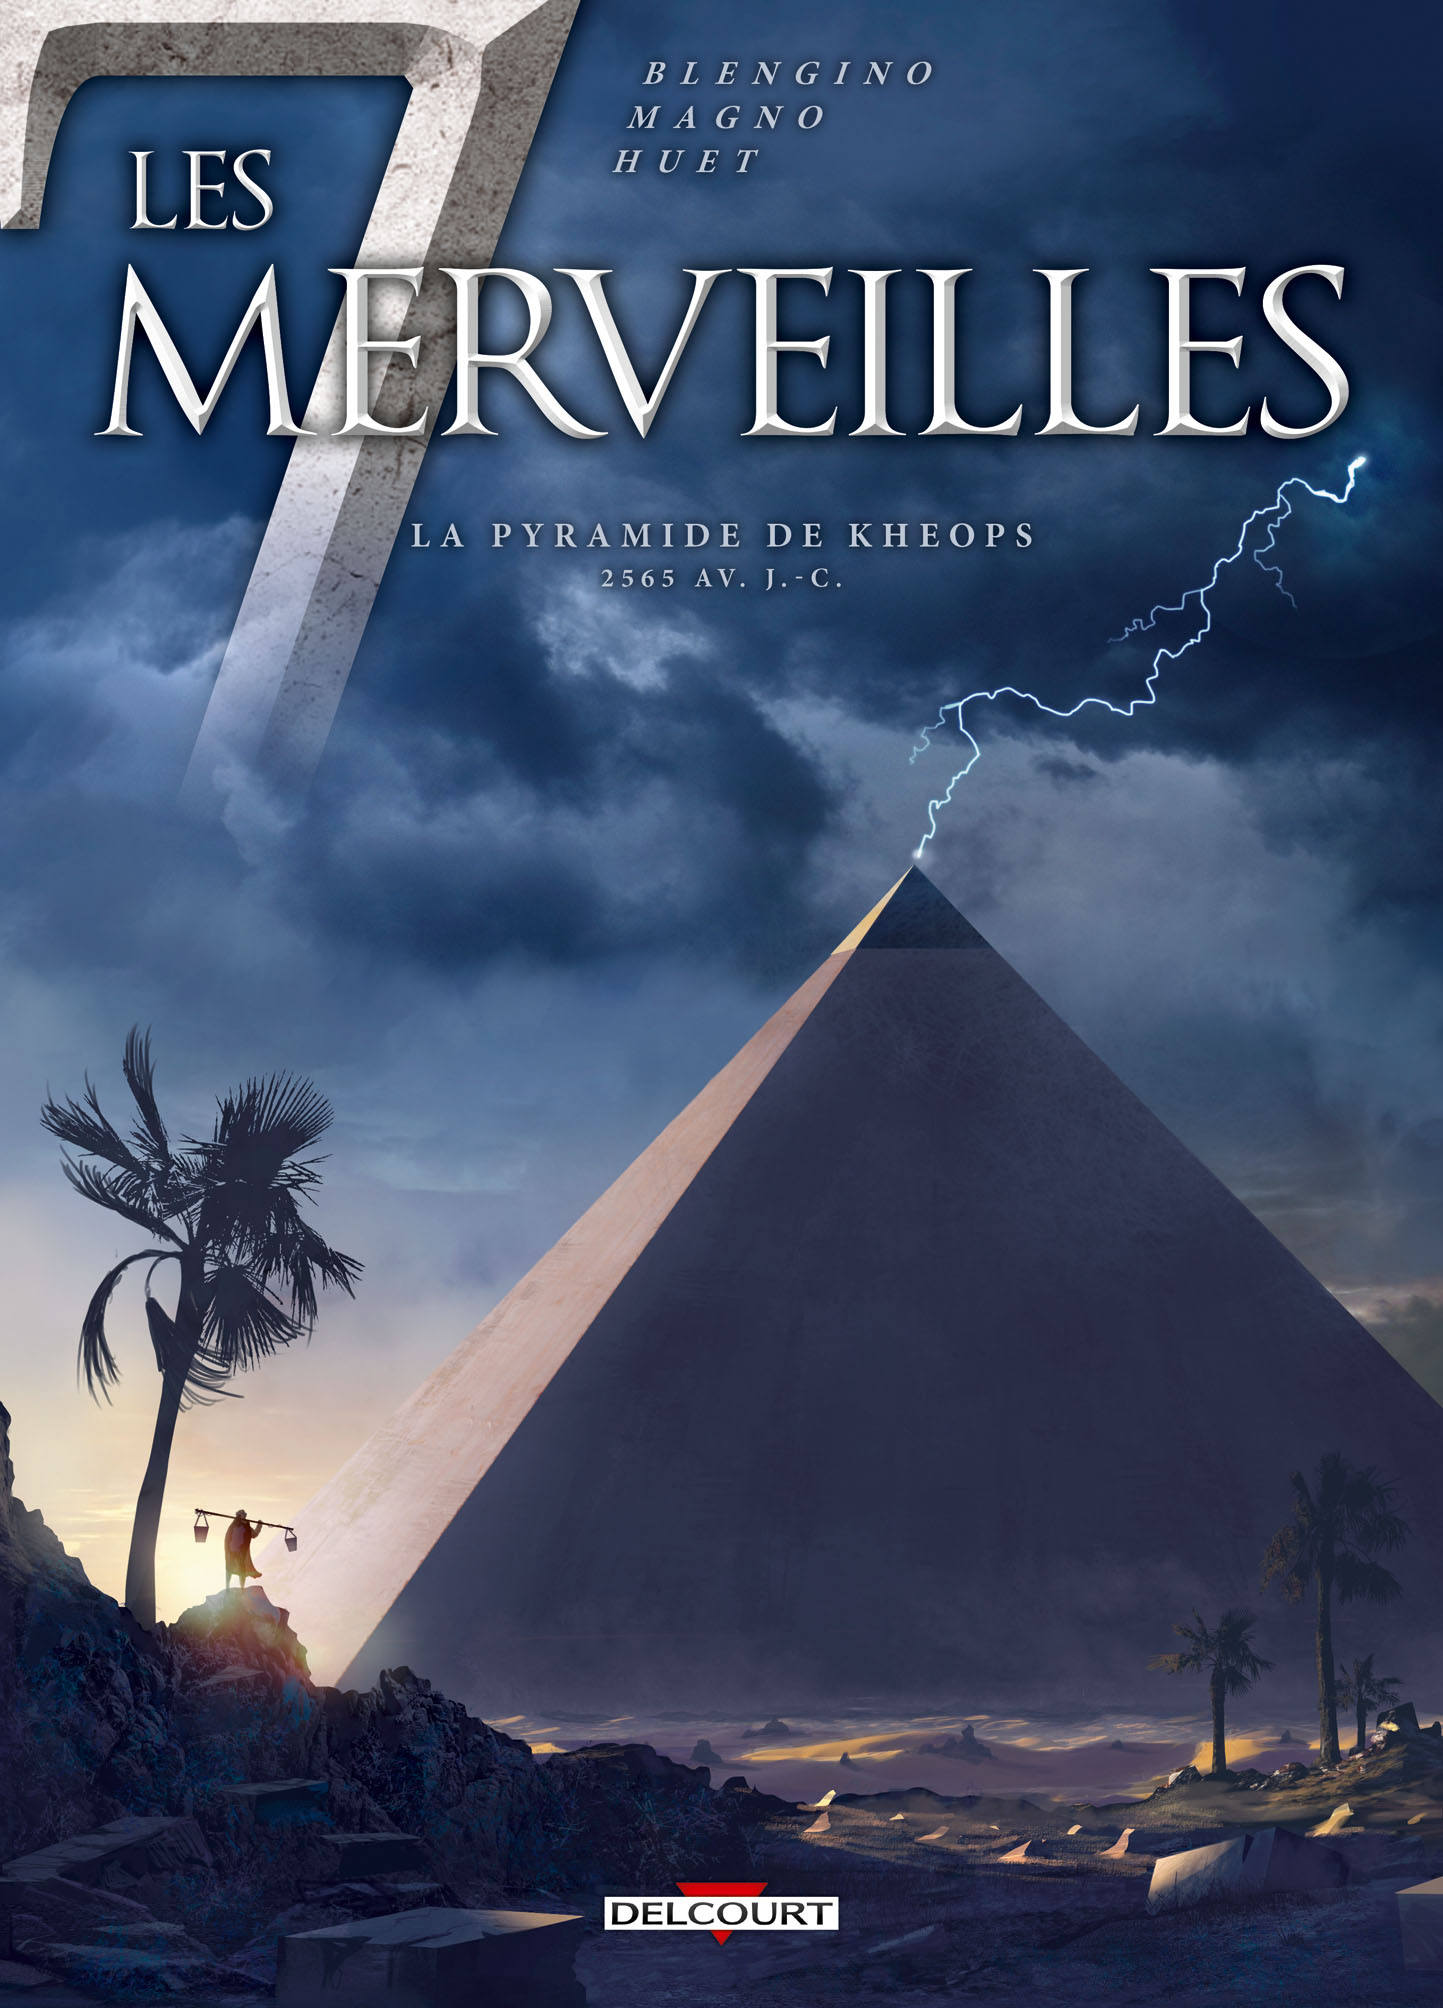 7_merveilles_la_pyramide_de_kheops_couverture